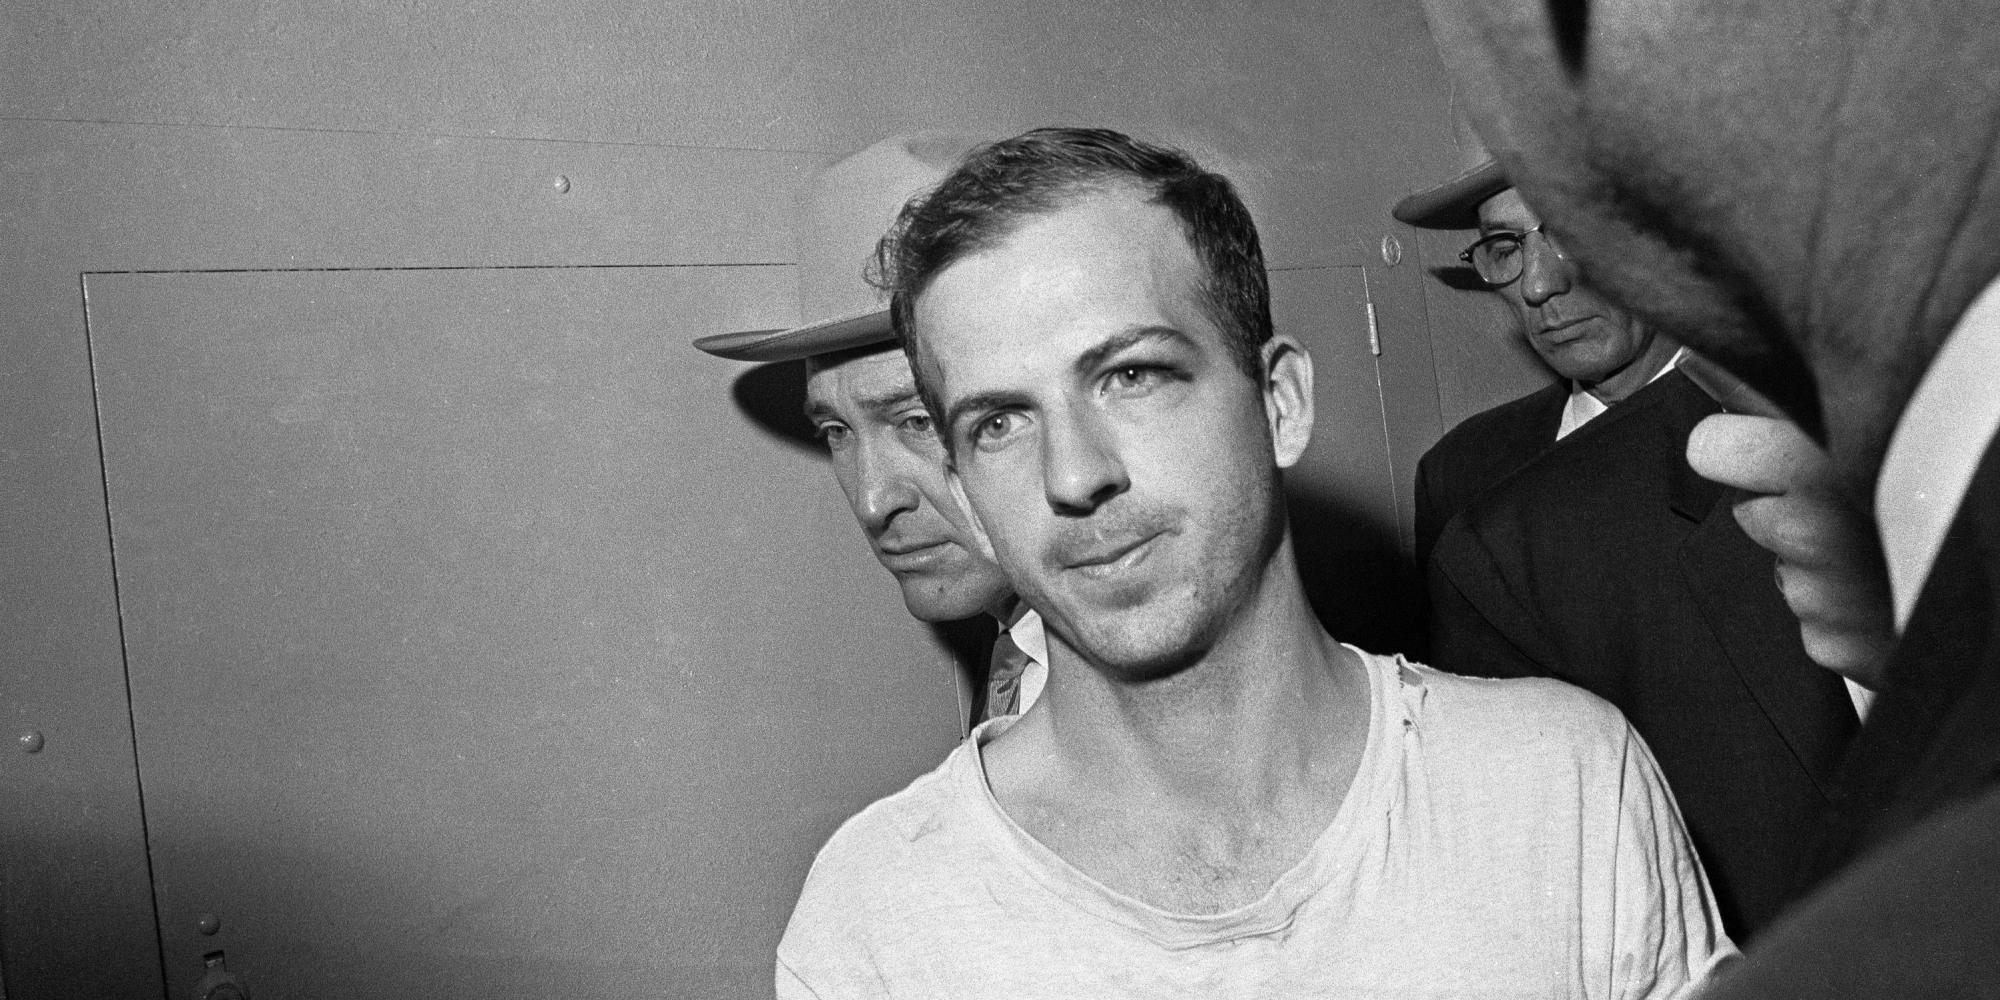 Lee Harvey Oswald, o assassino de John F. Kennedy